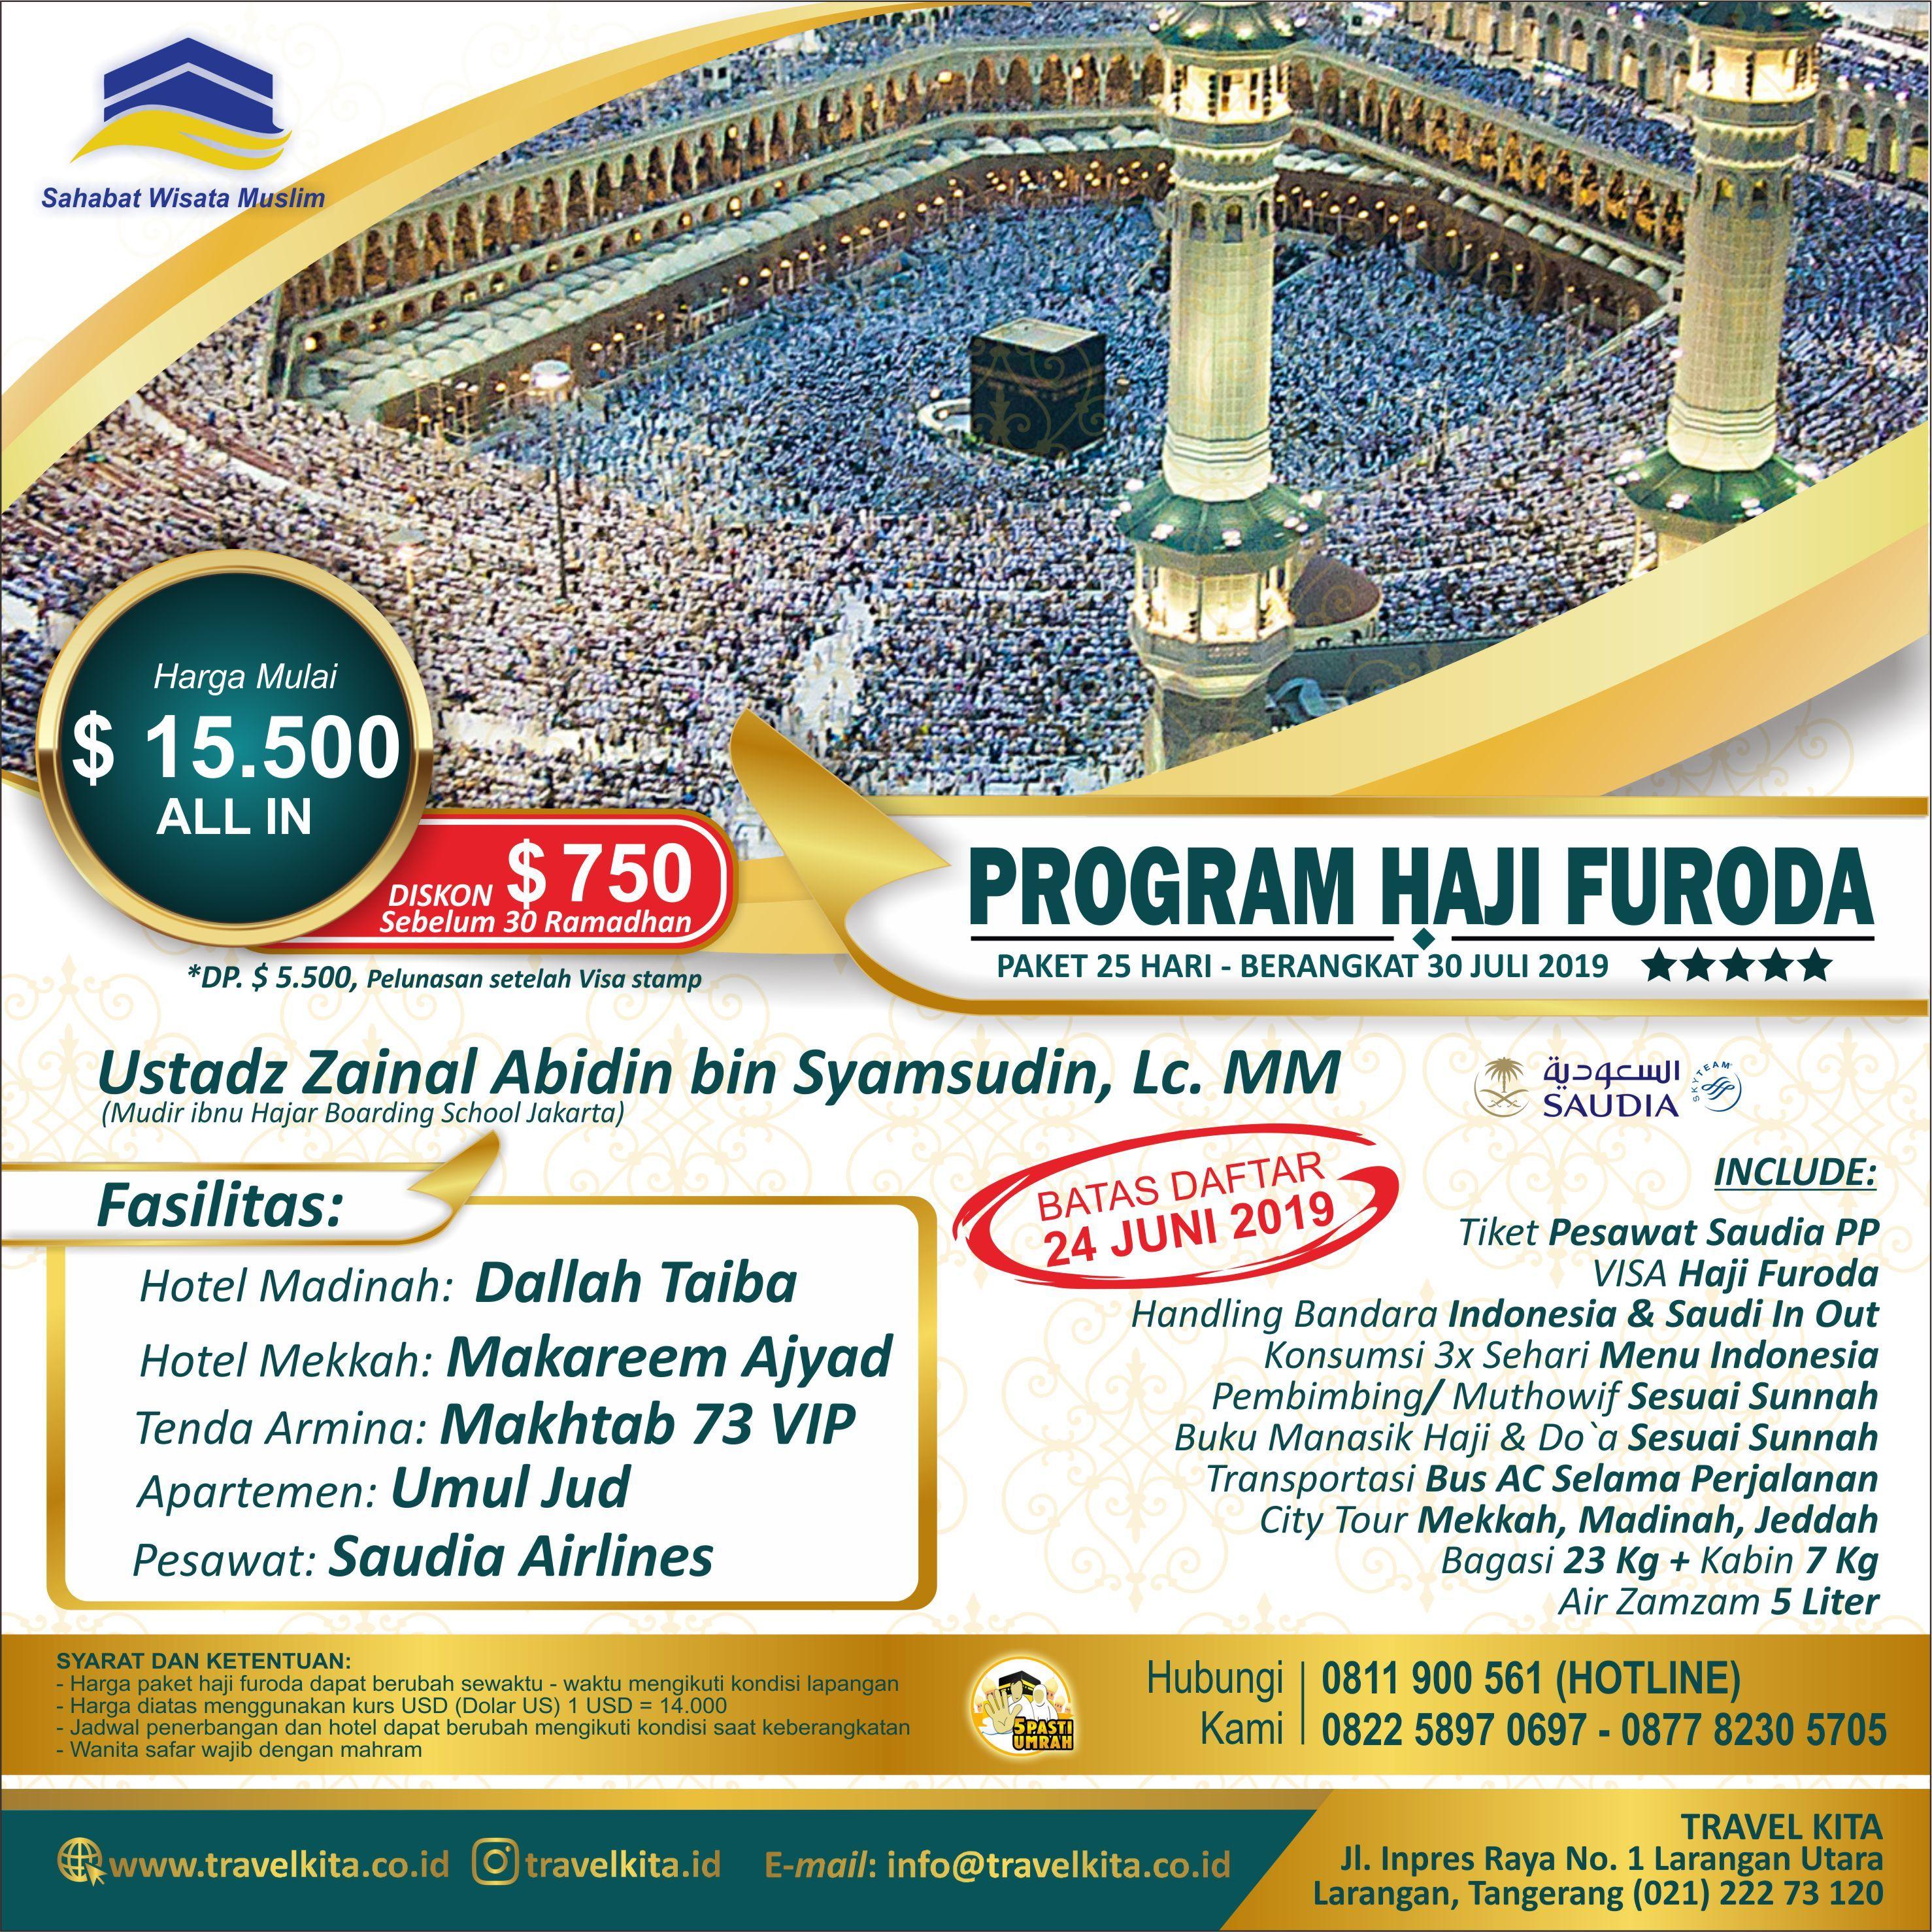 Haji Khusus Visa Furoda 1440 H